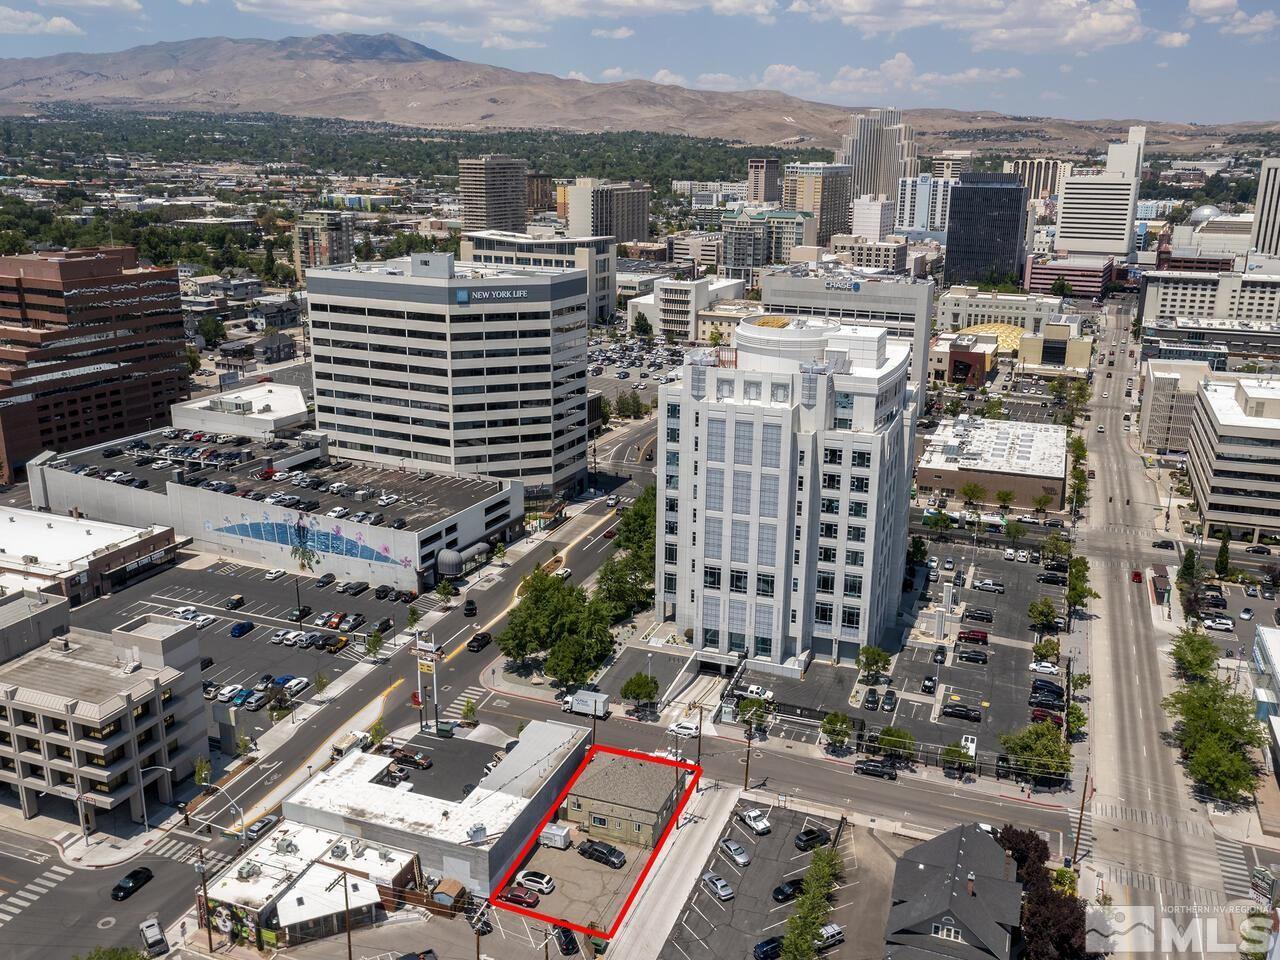 Image for 18 STEWART ST, Reno, NV 89501